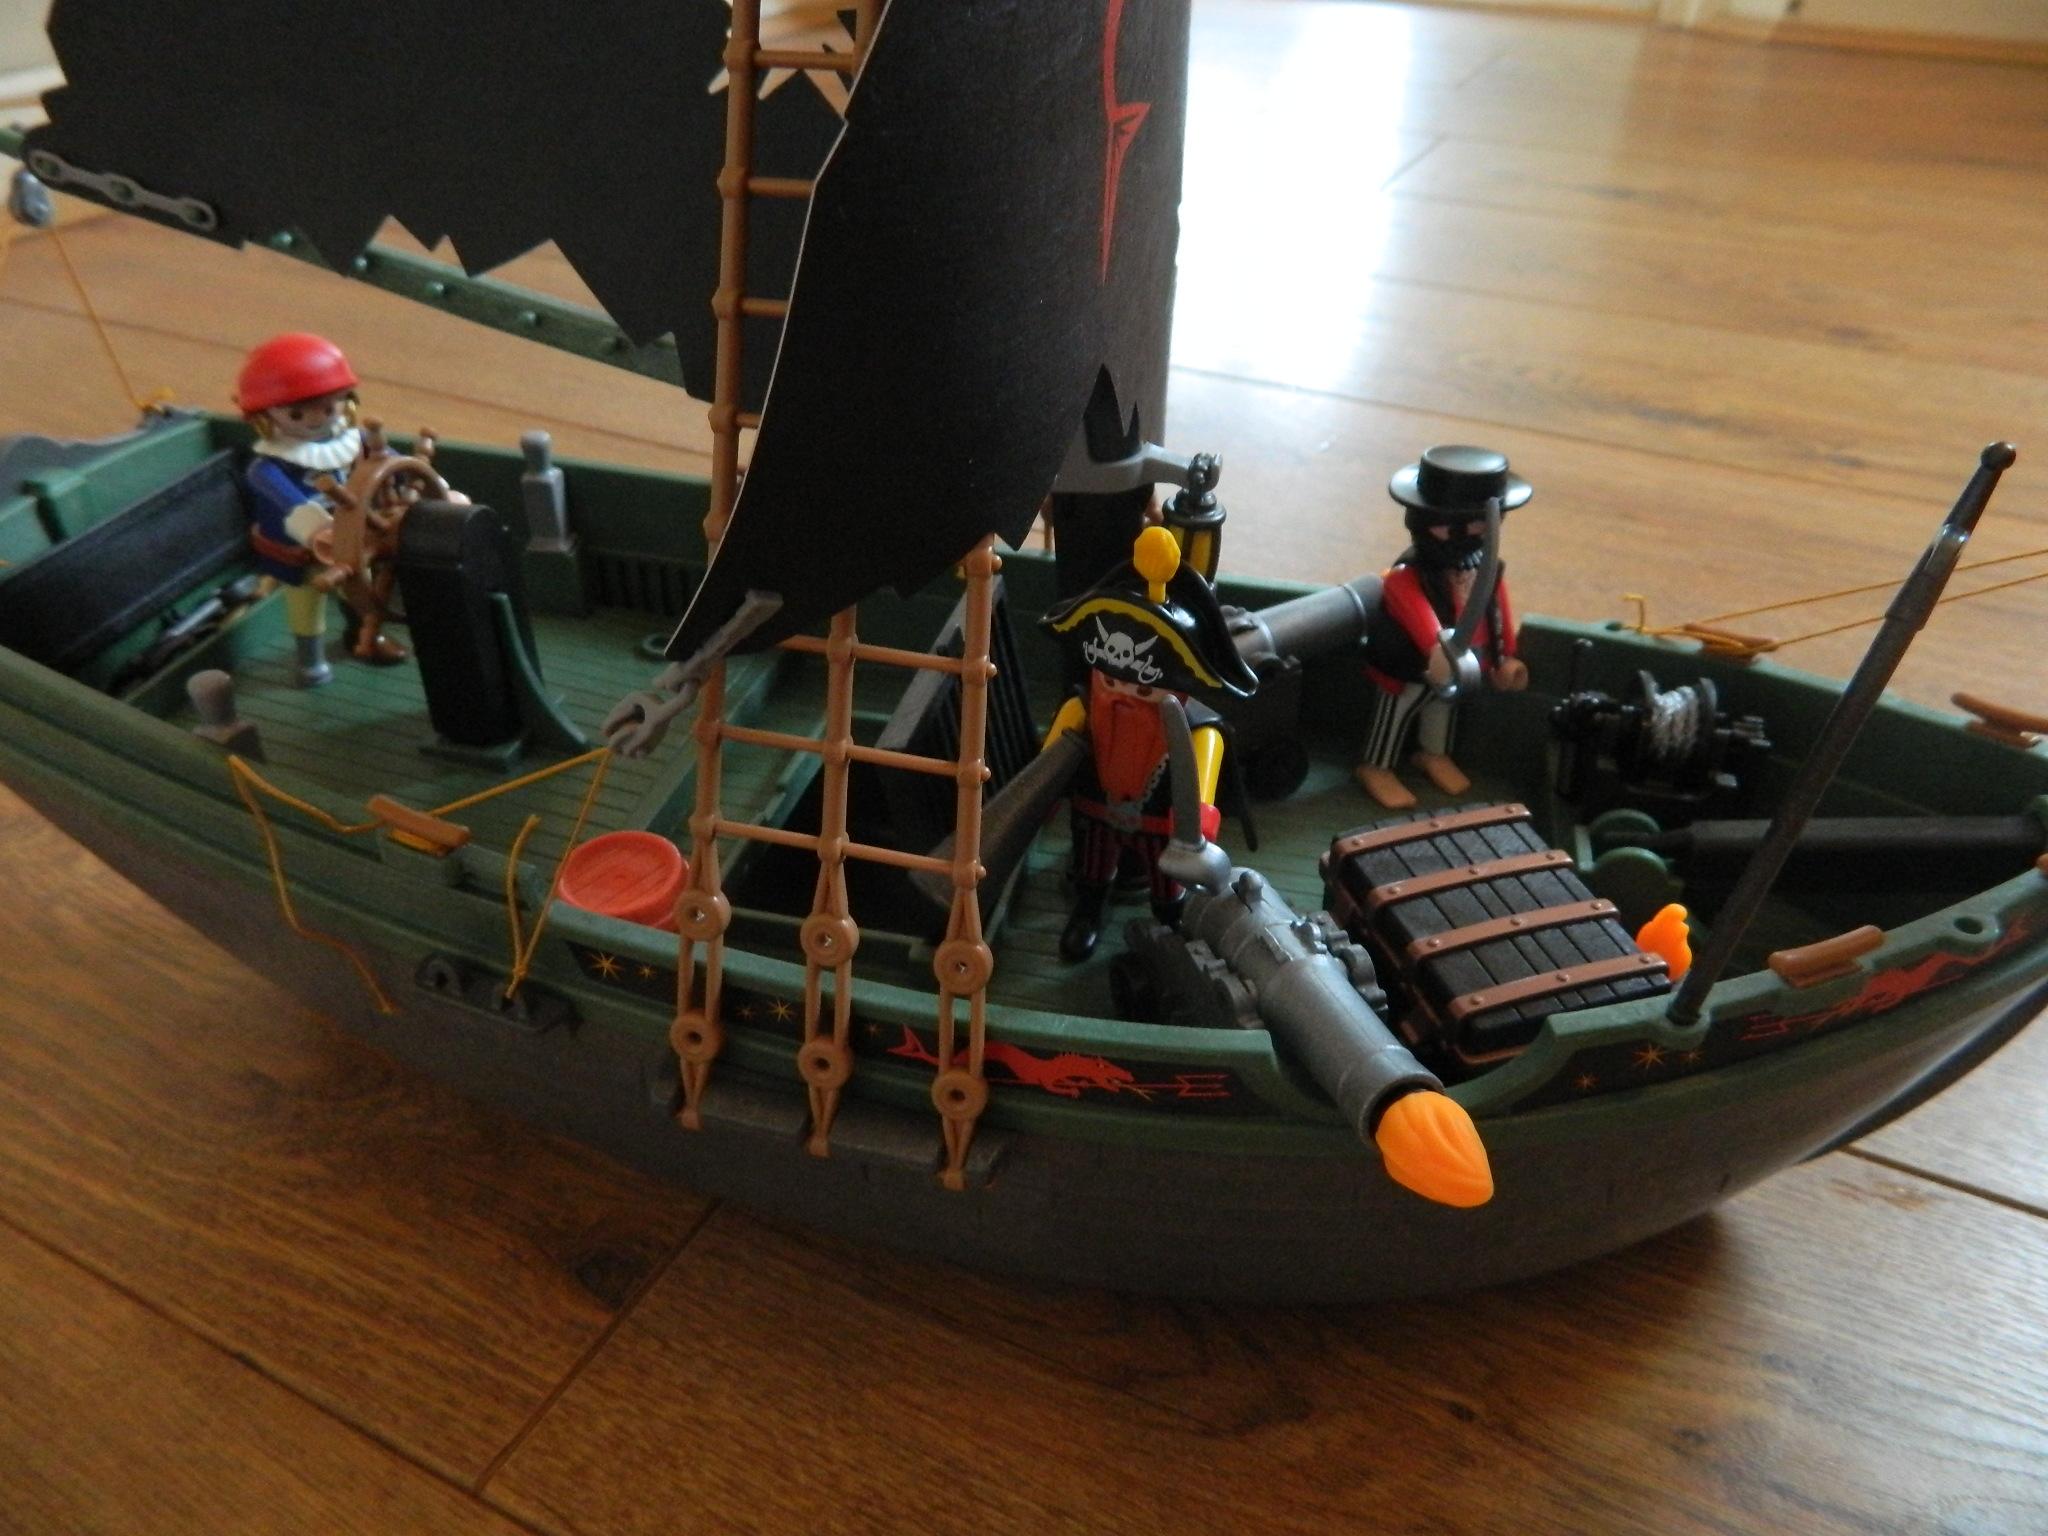 Playmobil Pirates: Pirates Ship with RC Underwater Motor View Image